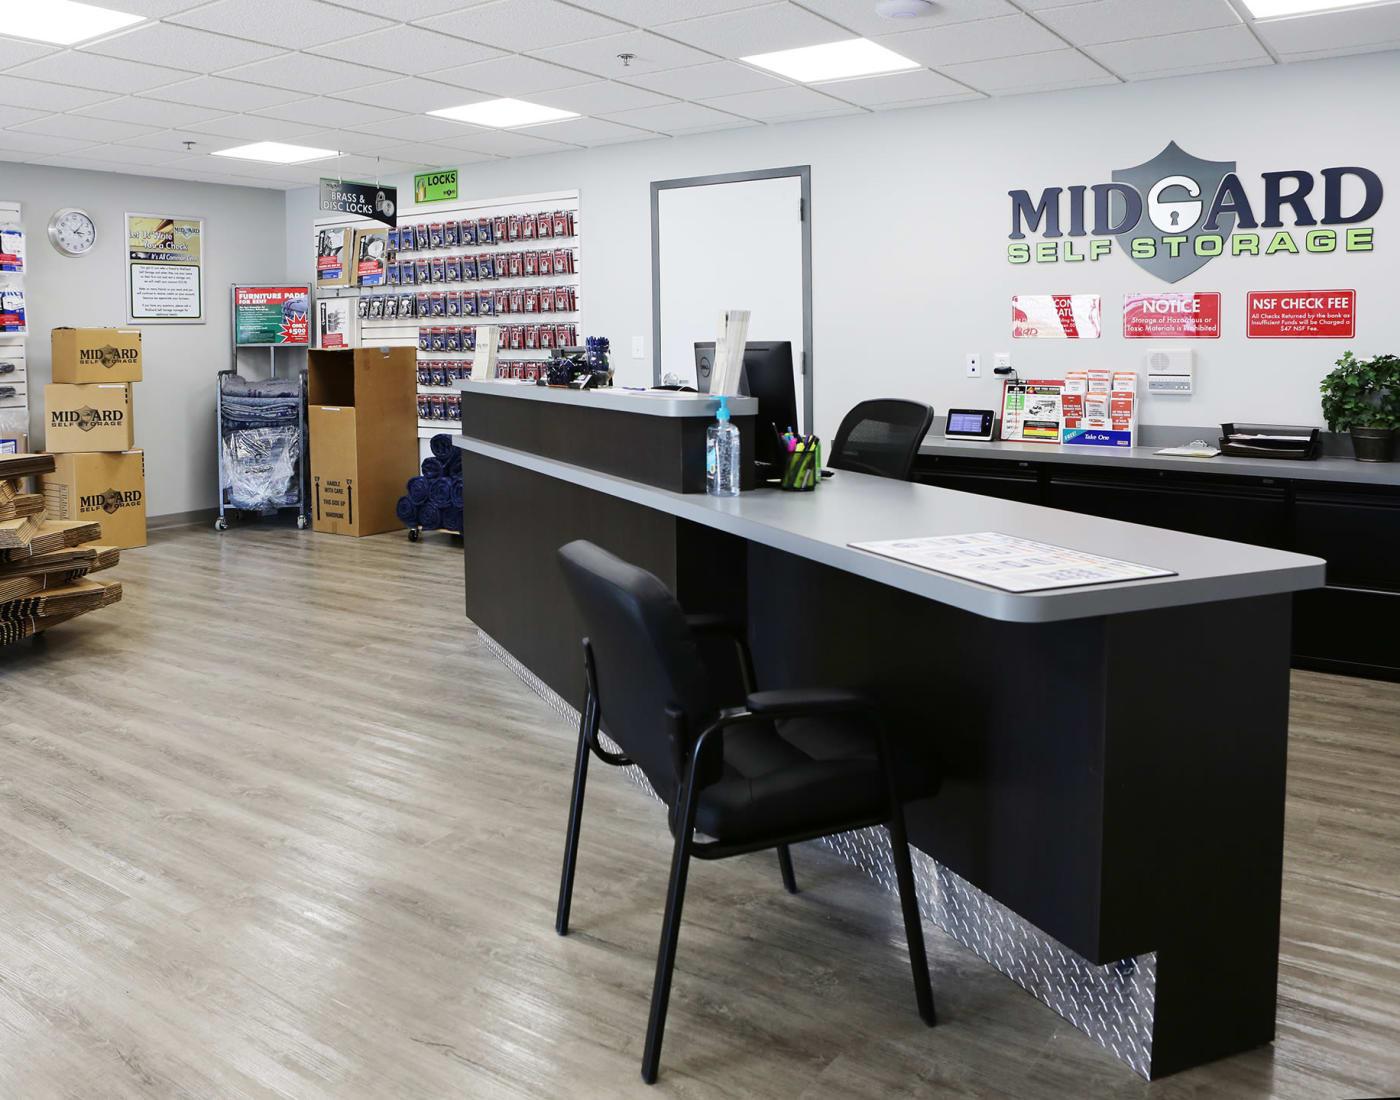 Leasing office at Midgard Self Storage in Brevard, North Carolina